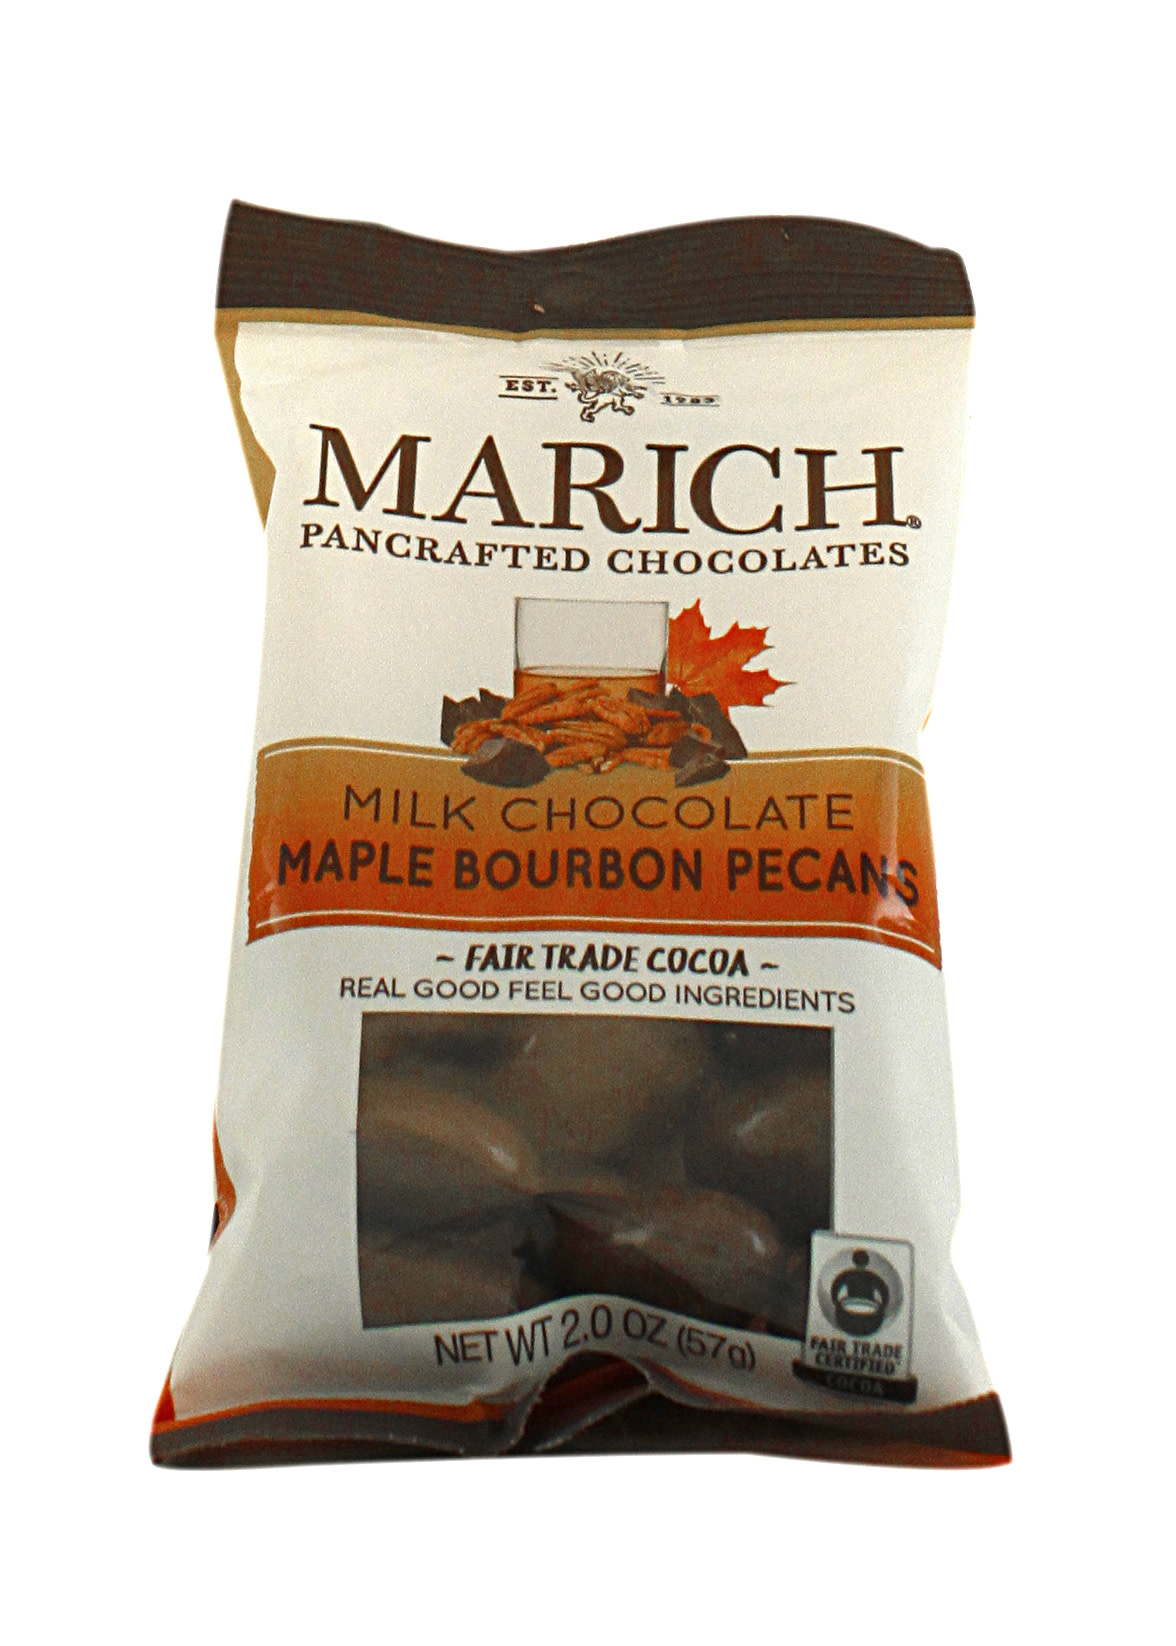 Marich Milk Chocolate Maple Bourbon Pecans, 2.1 oz